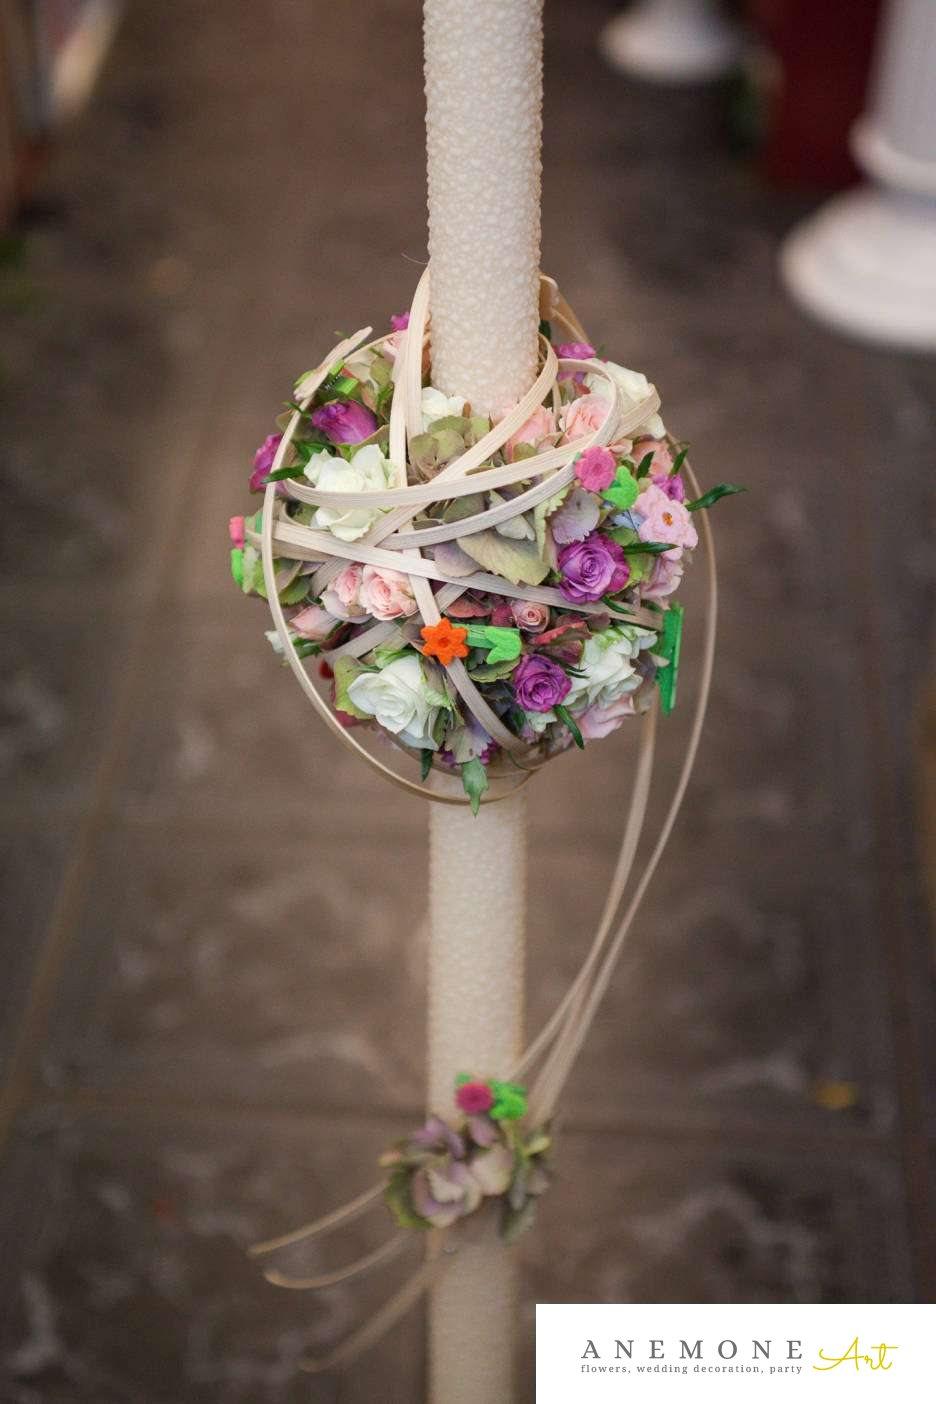 Poza, foto cu Flori de nunta hortensia, lumanare cununie, mini-rosa, multicolor, trandafiri in Arad, Timisoara, Oradea (wedding flowers, bouquets) nunta Arad, Timisoara, Oradea